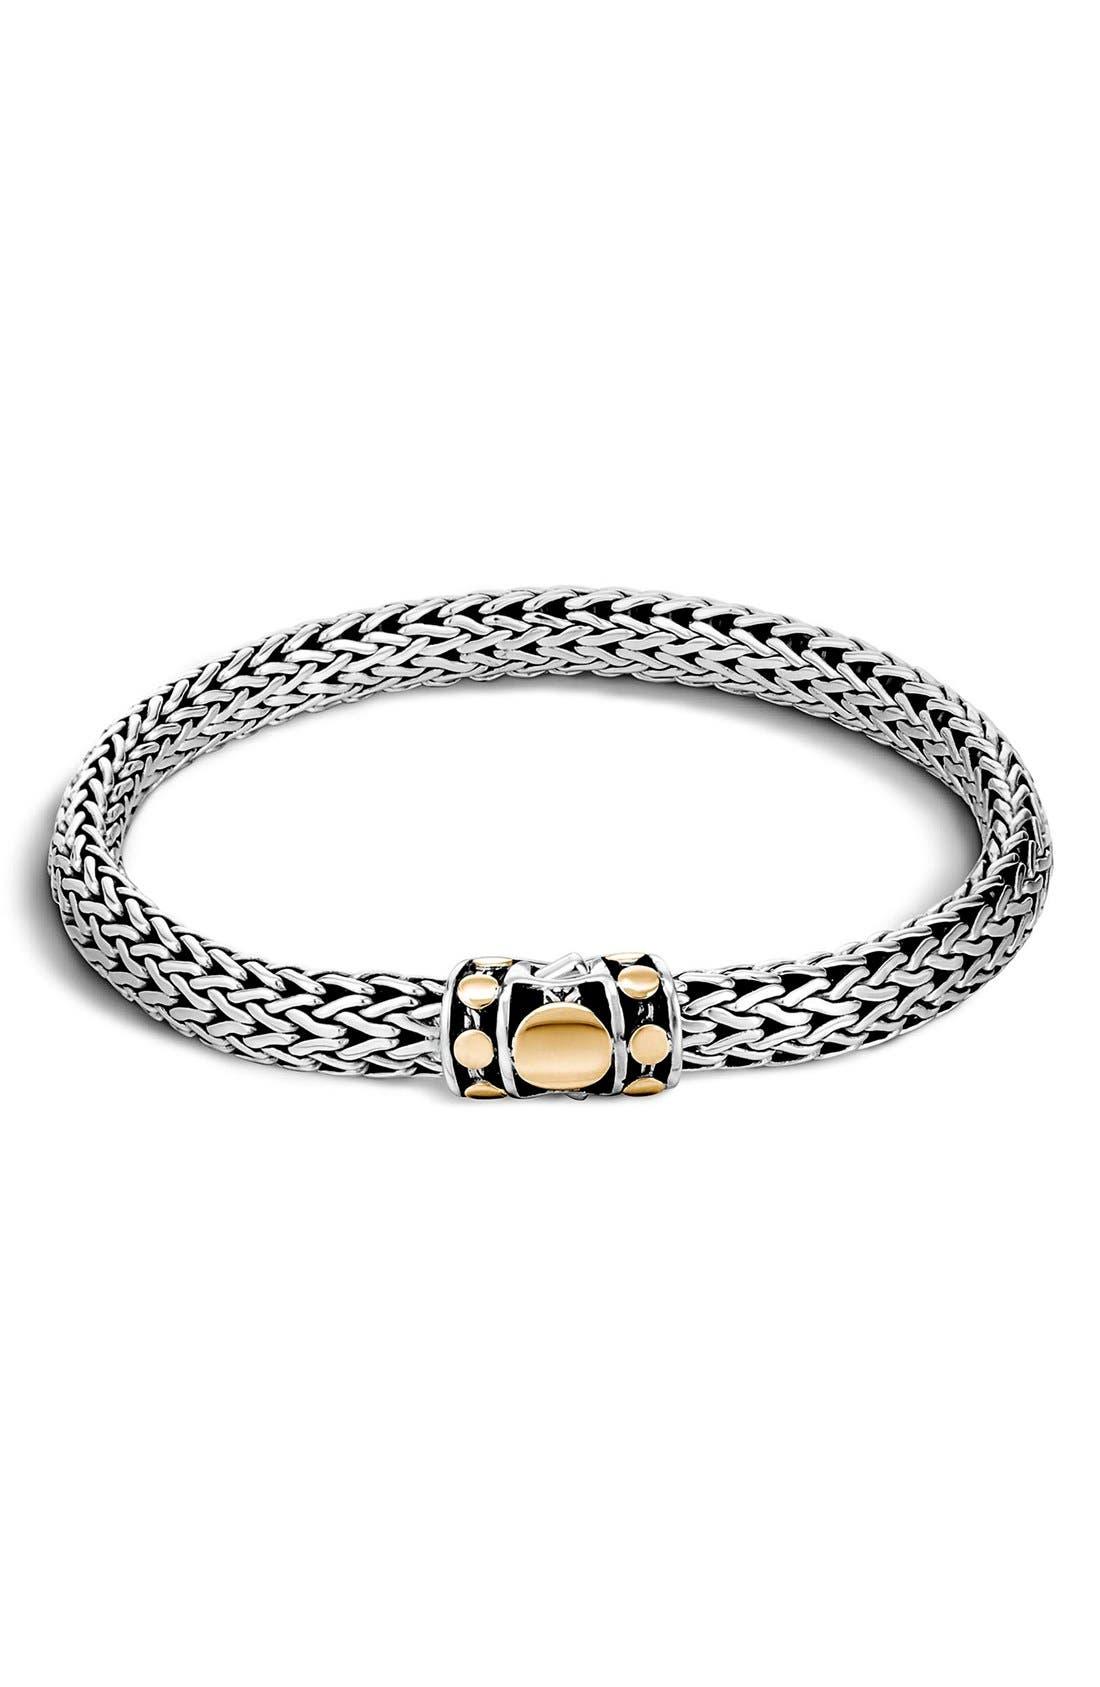 Alternate Image 1 Selected - John Hardy 'Dot' Gold & Silver Chain Bracelet